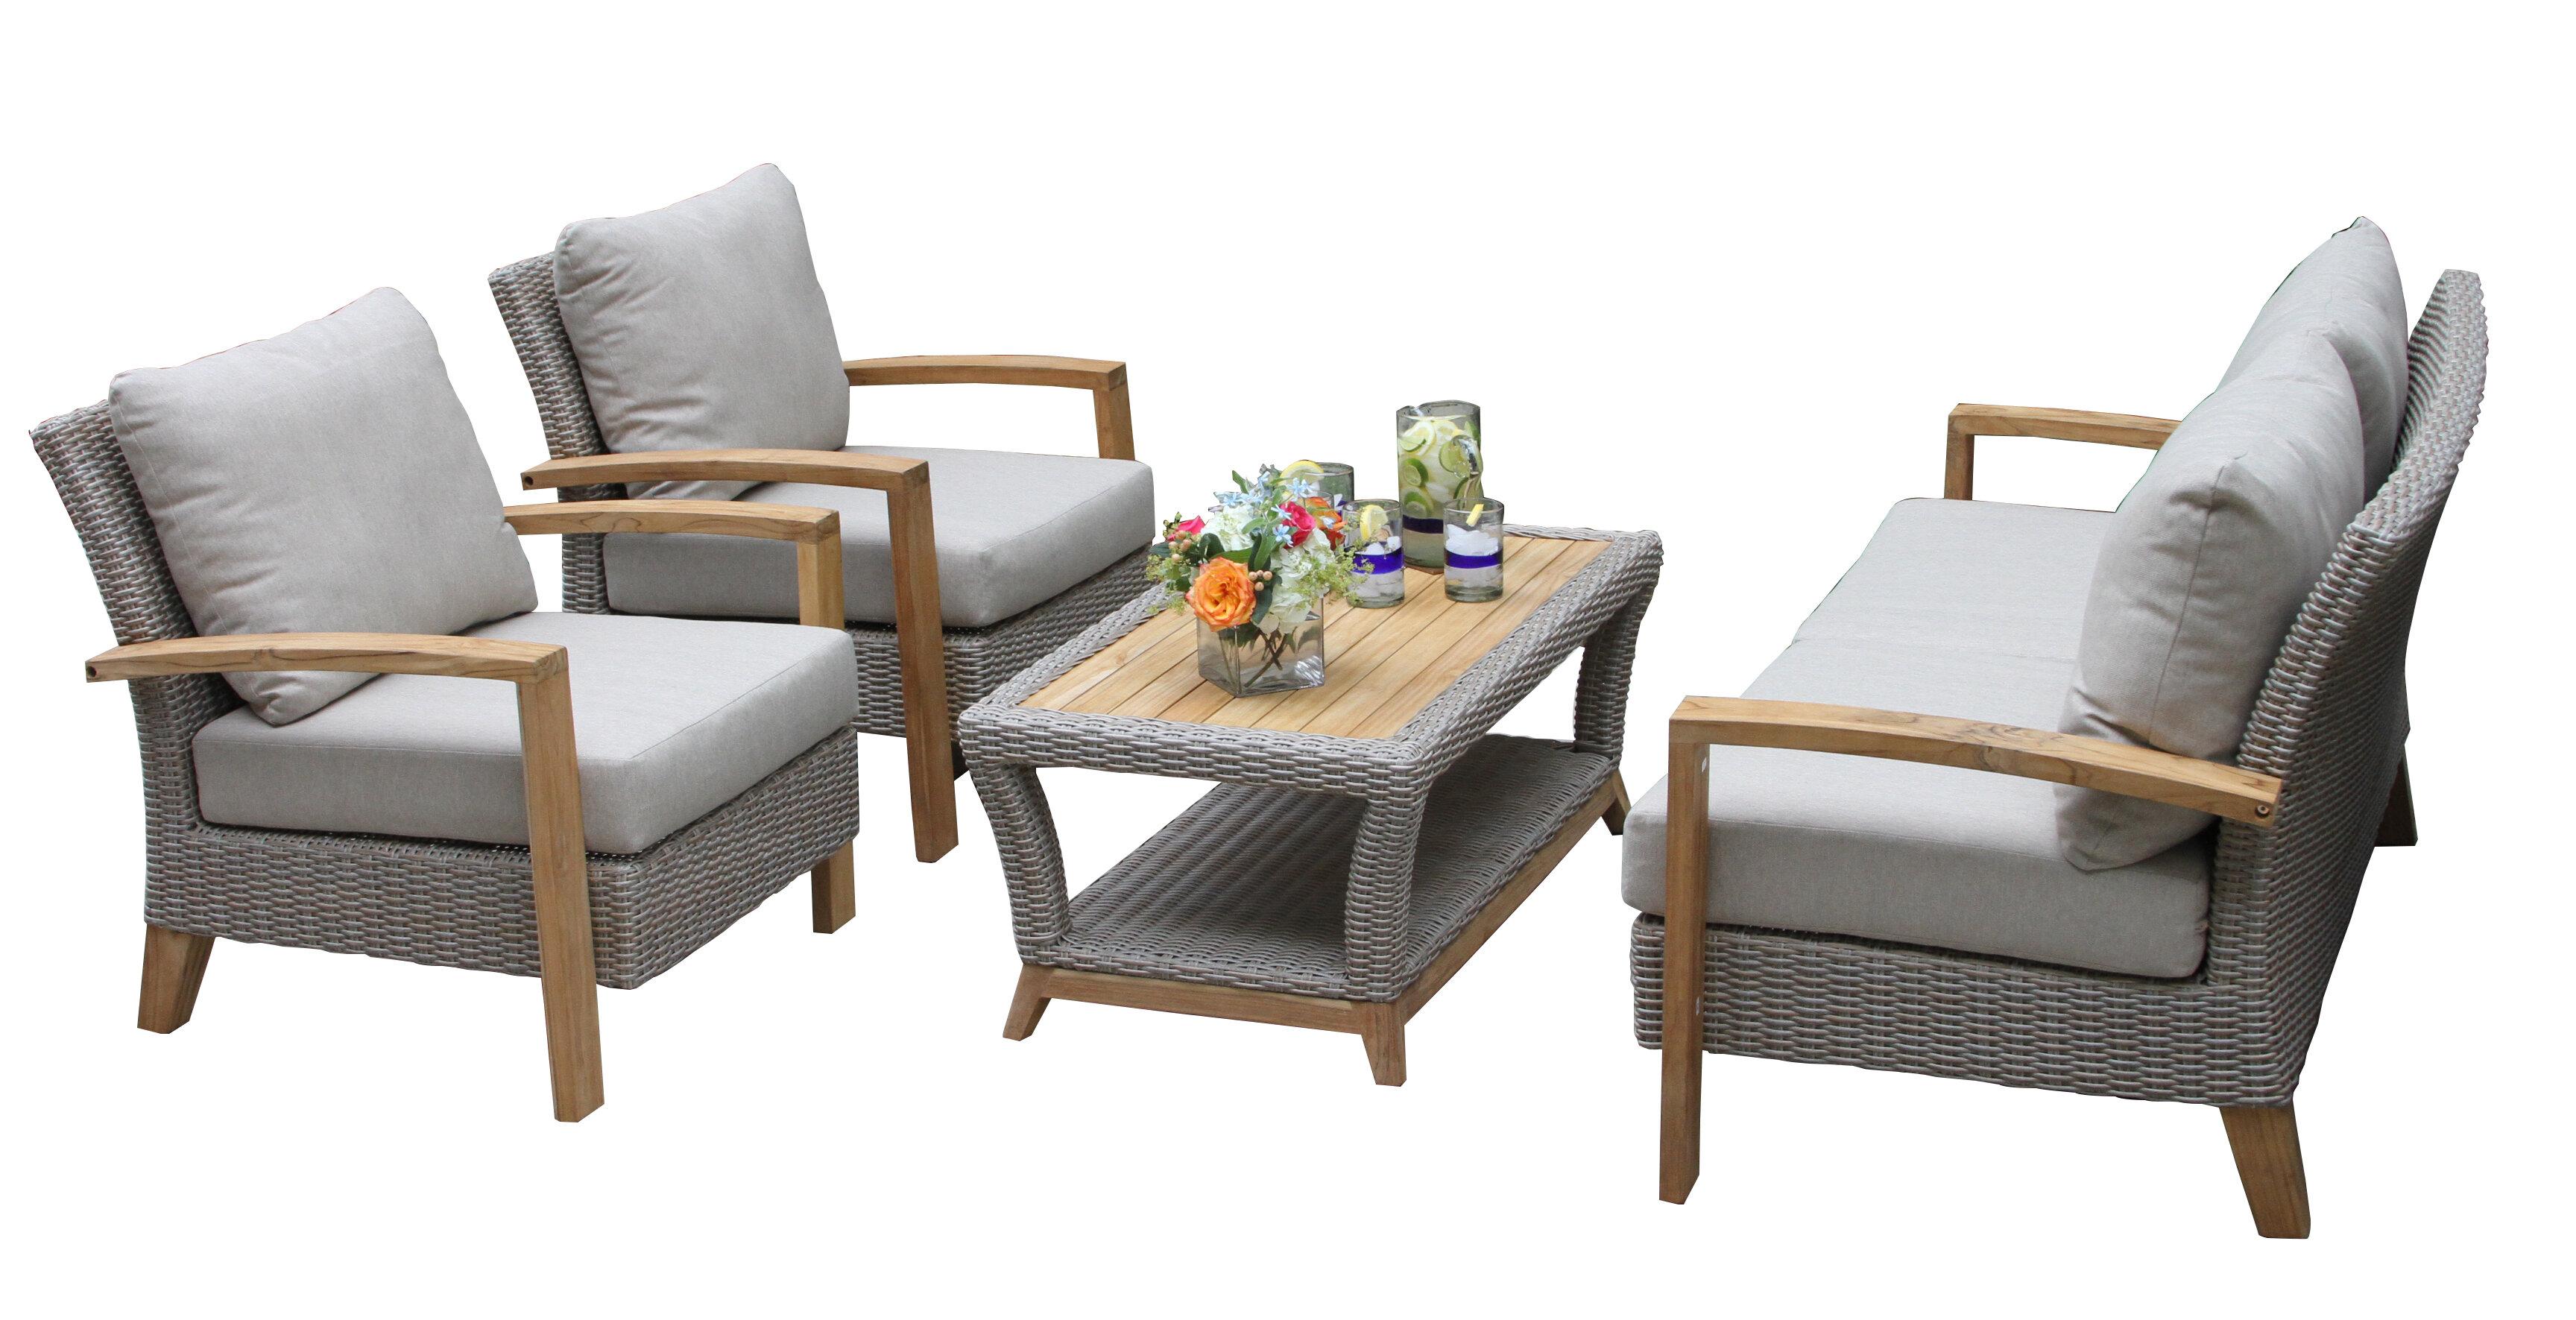 Dillard 4 Piece Rattan Sofa Seating Group With Cushions Reviews